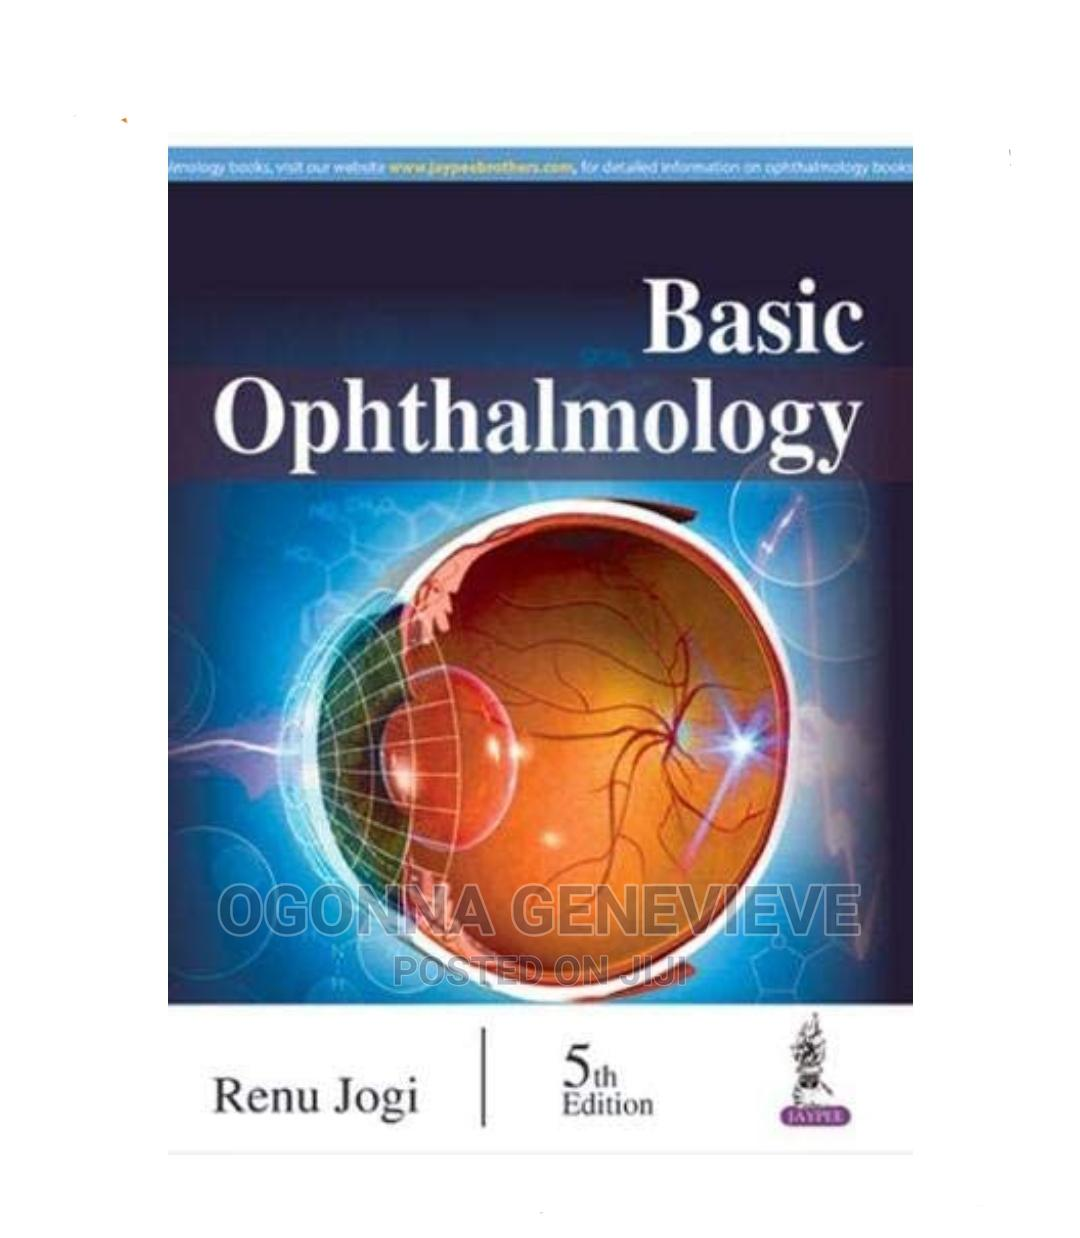 Basic Ophthalmology 5th Edition